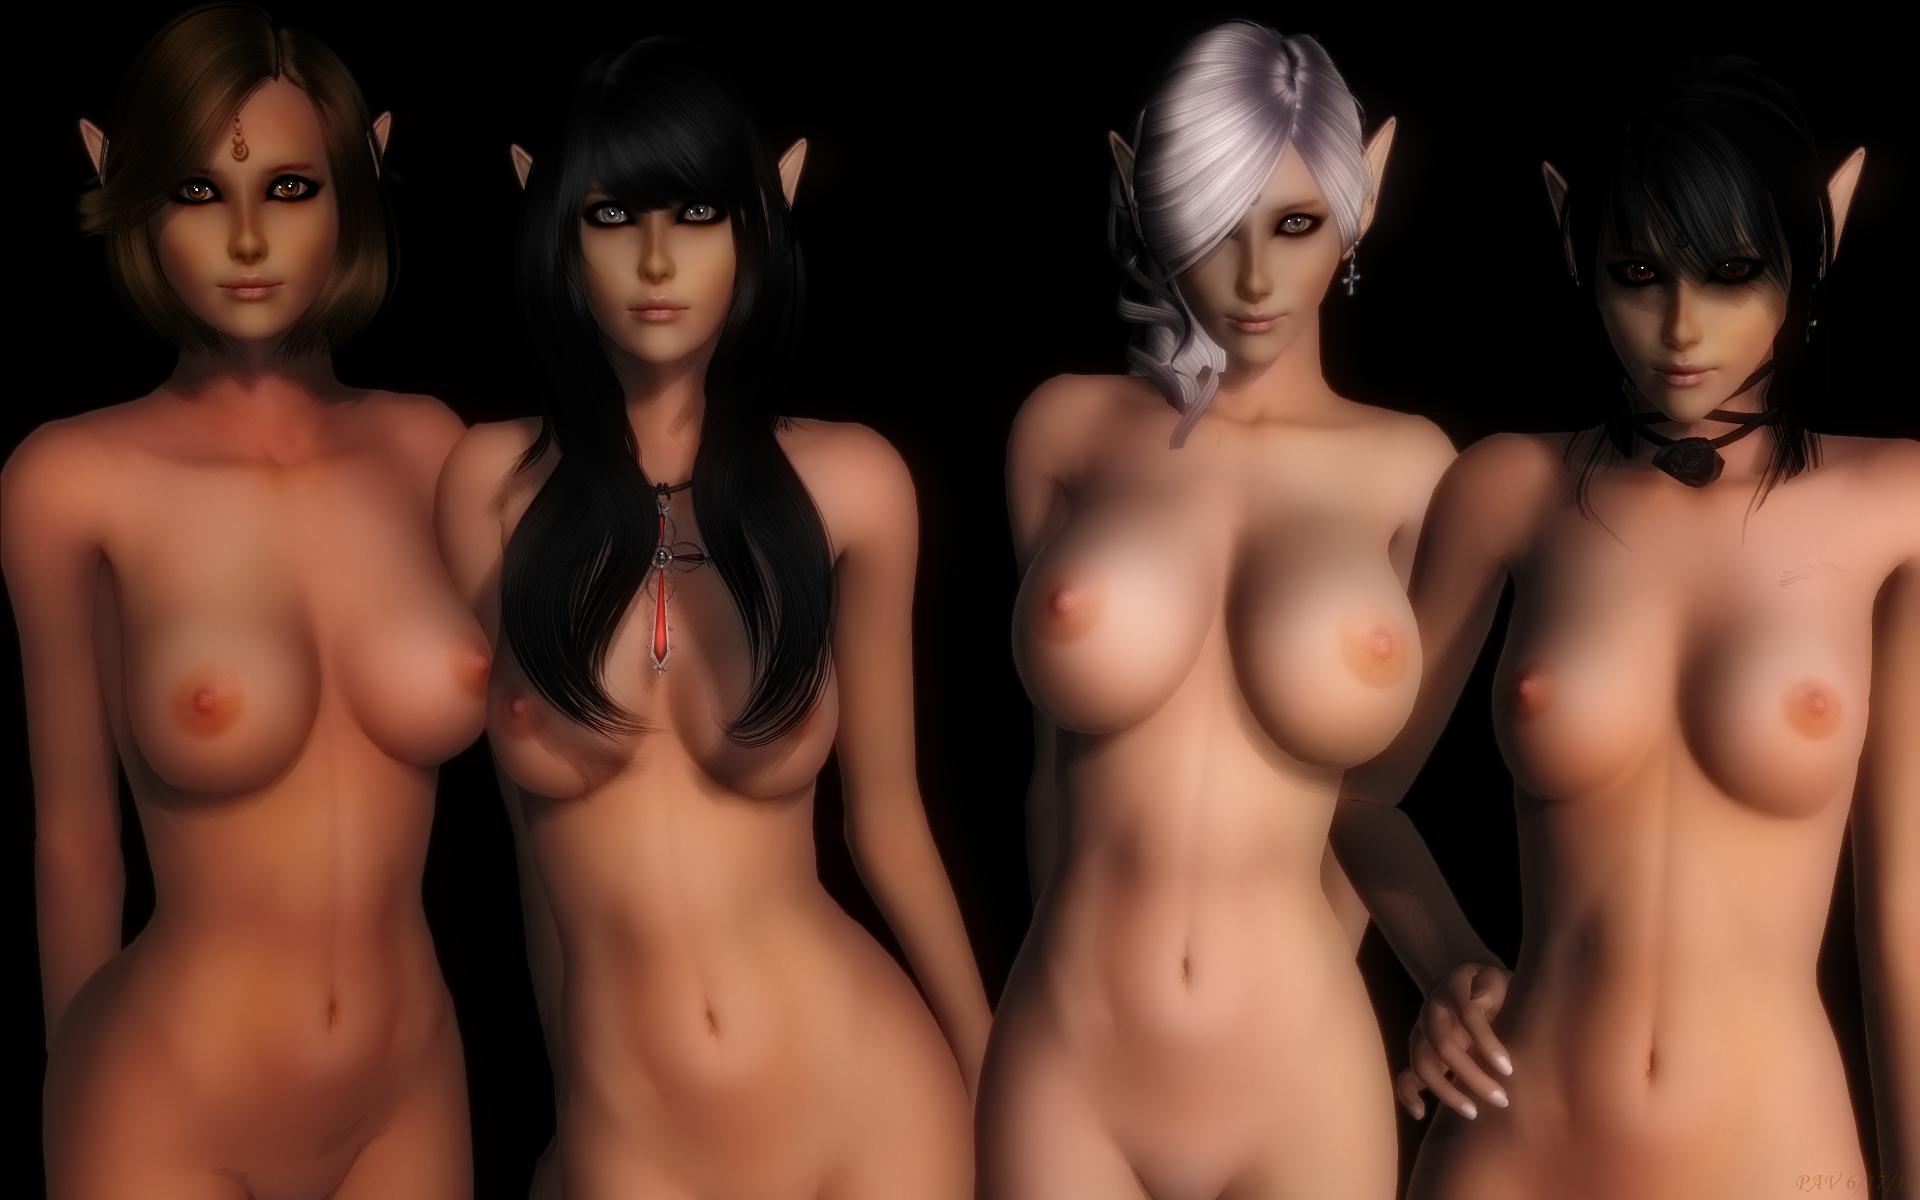 Unreal girls naked 15